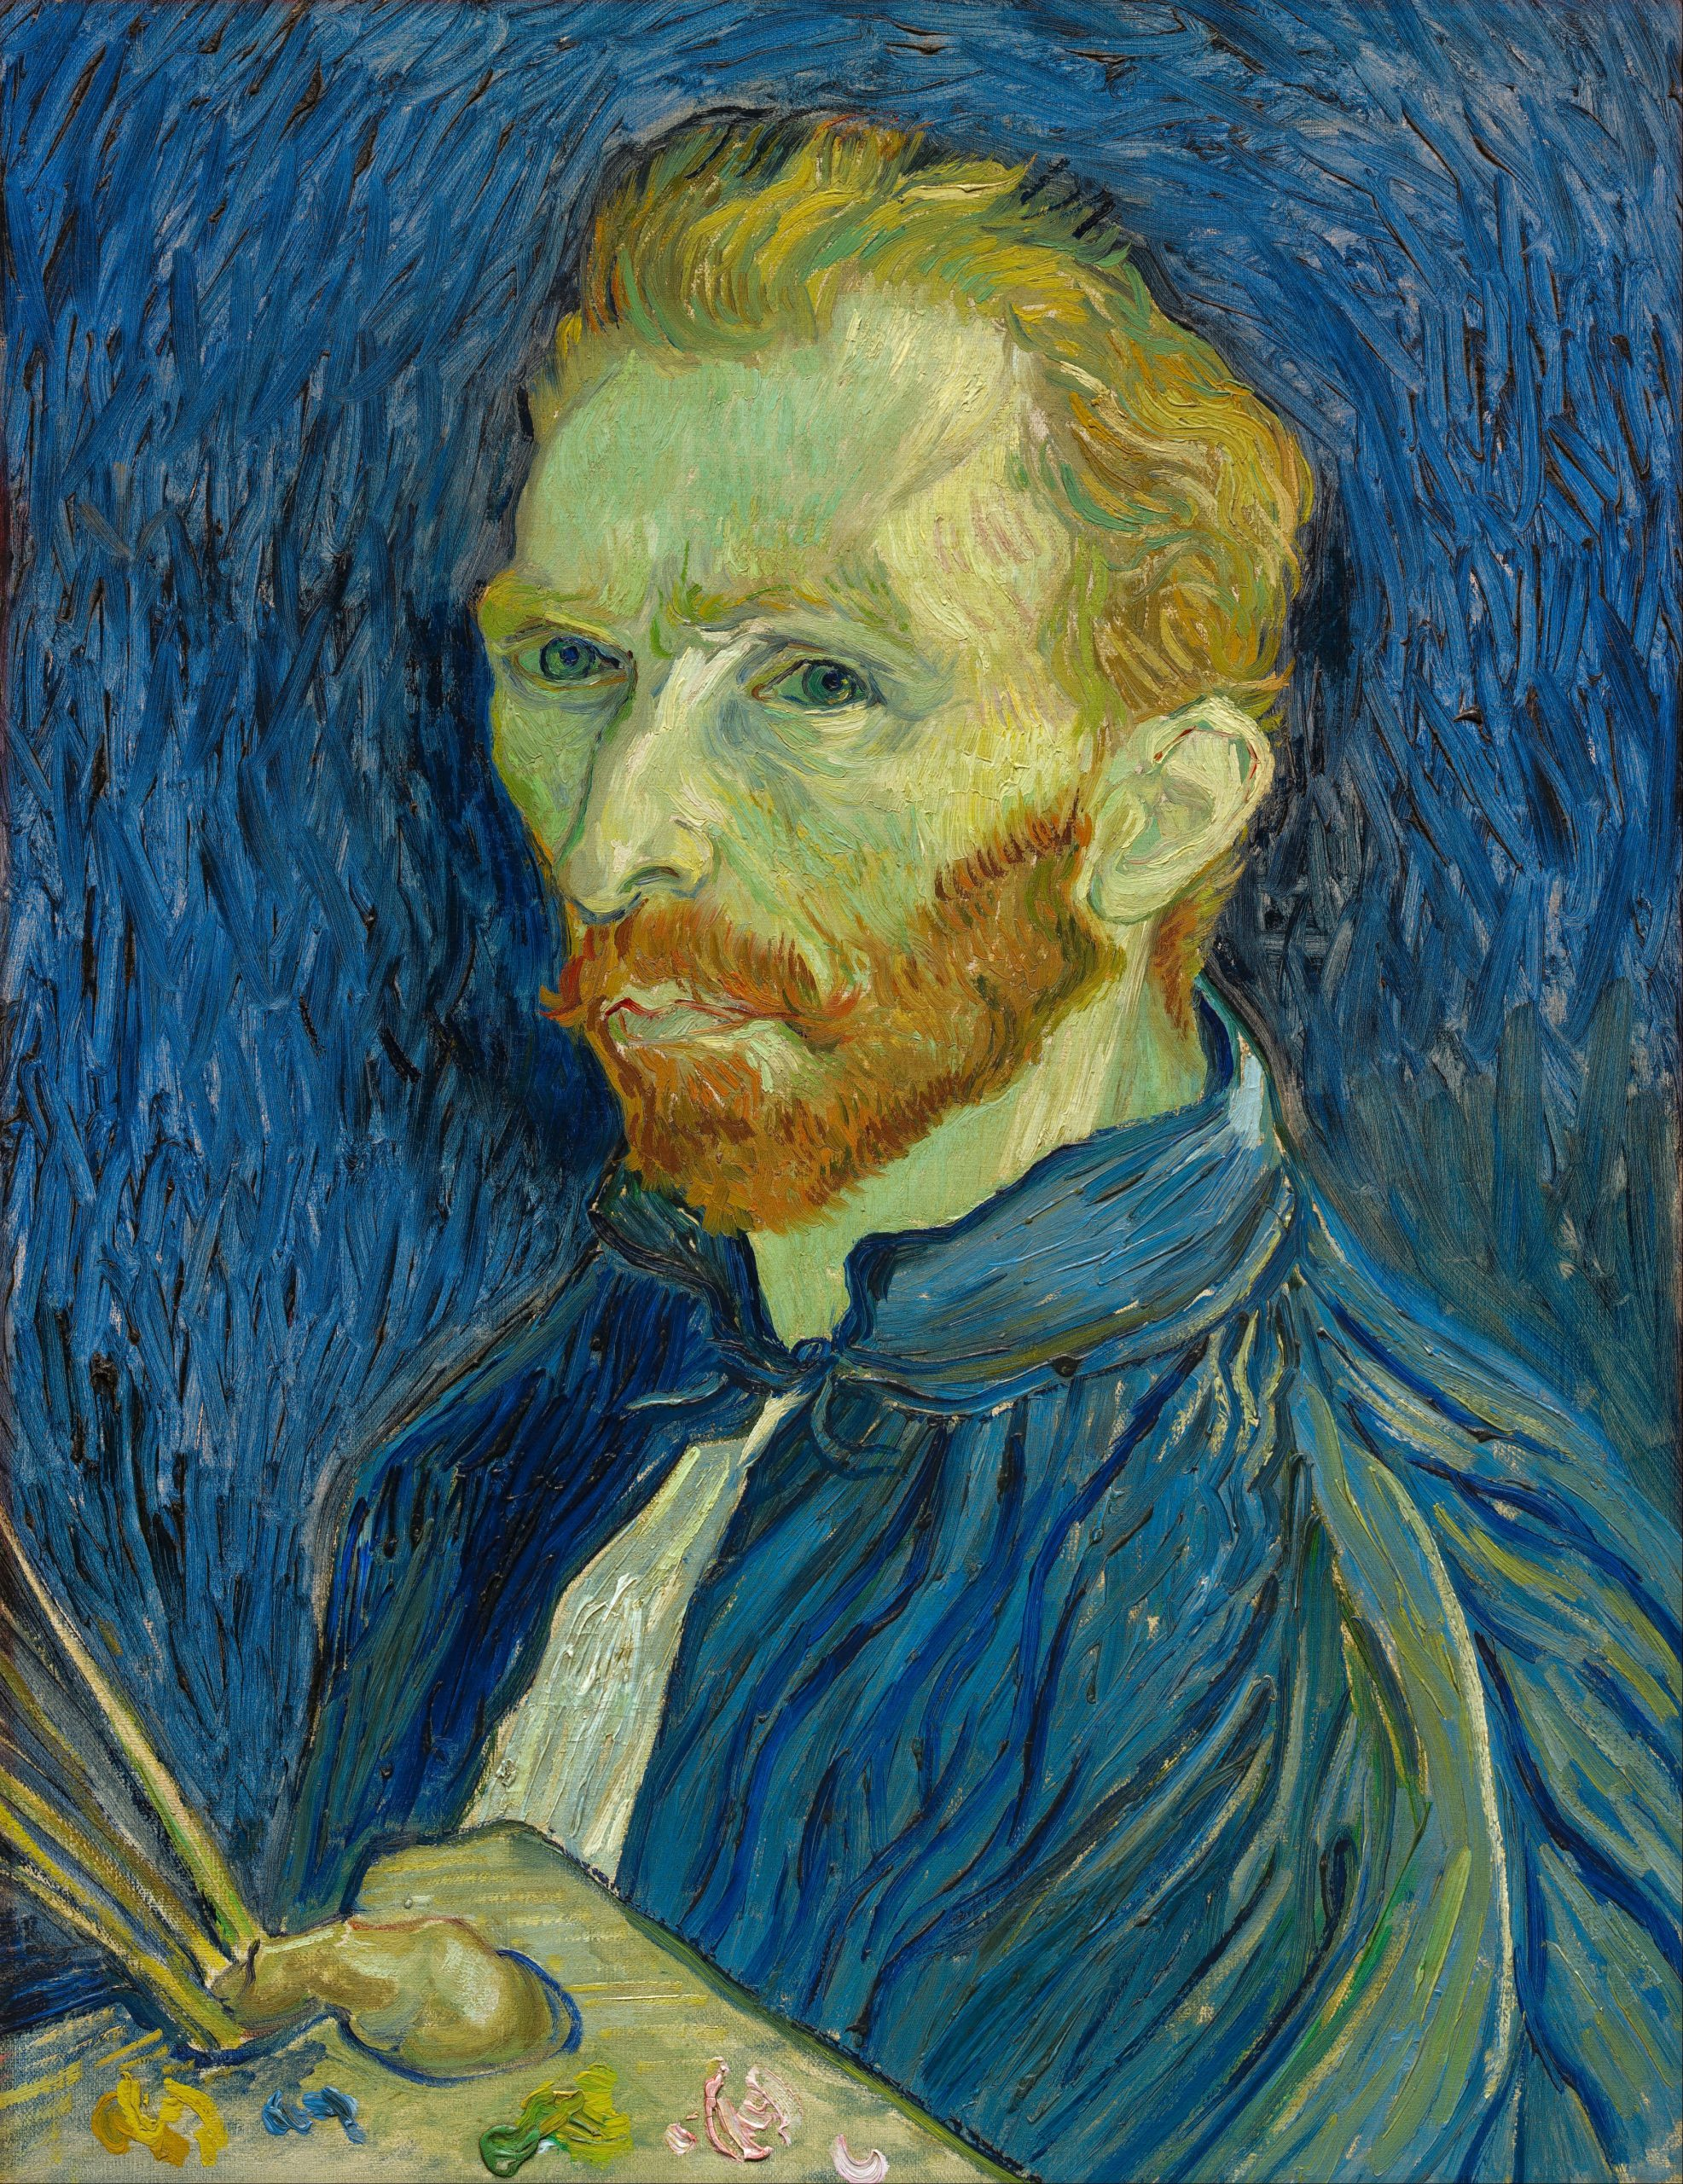 Vincent van Gogh - Self-Portrait, 1889. National Gallery of Art, Washington